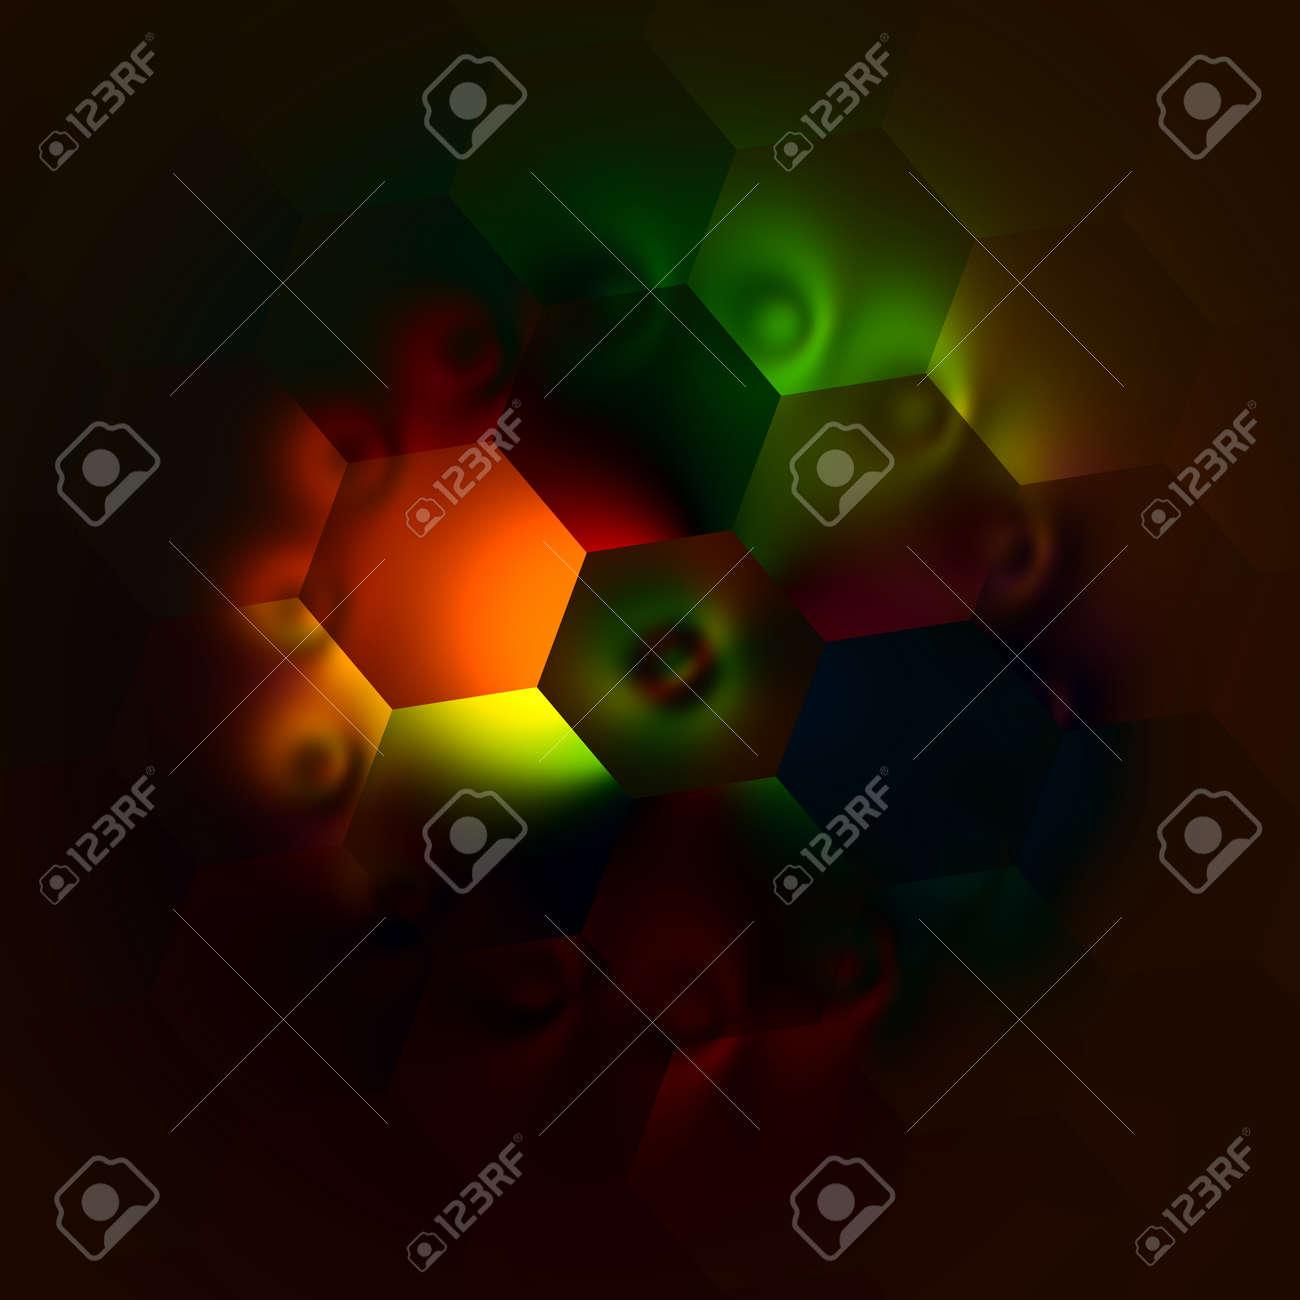 Abstract Shape Art Wallpaper 343402 - WallDevil